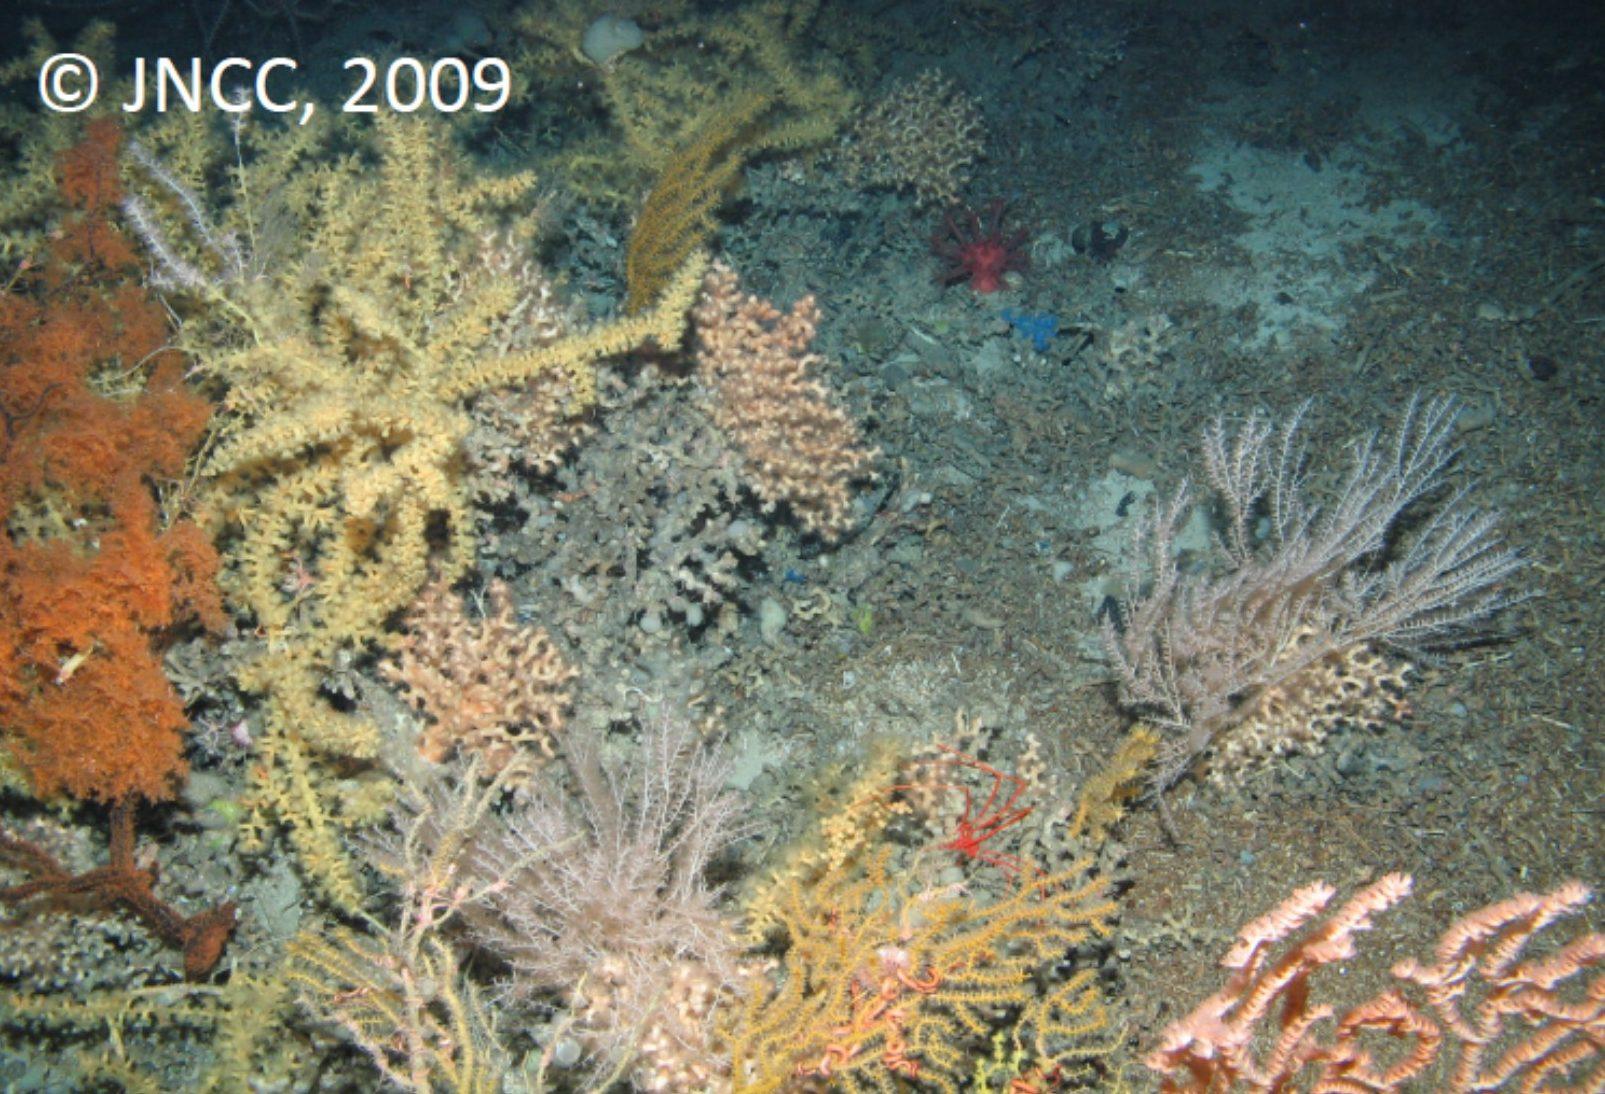 Mixed coral assemblage on Lophelia pertusa reef framework